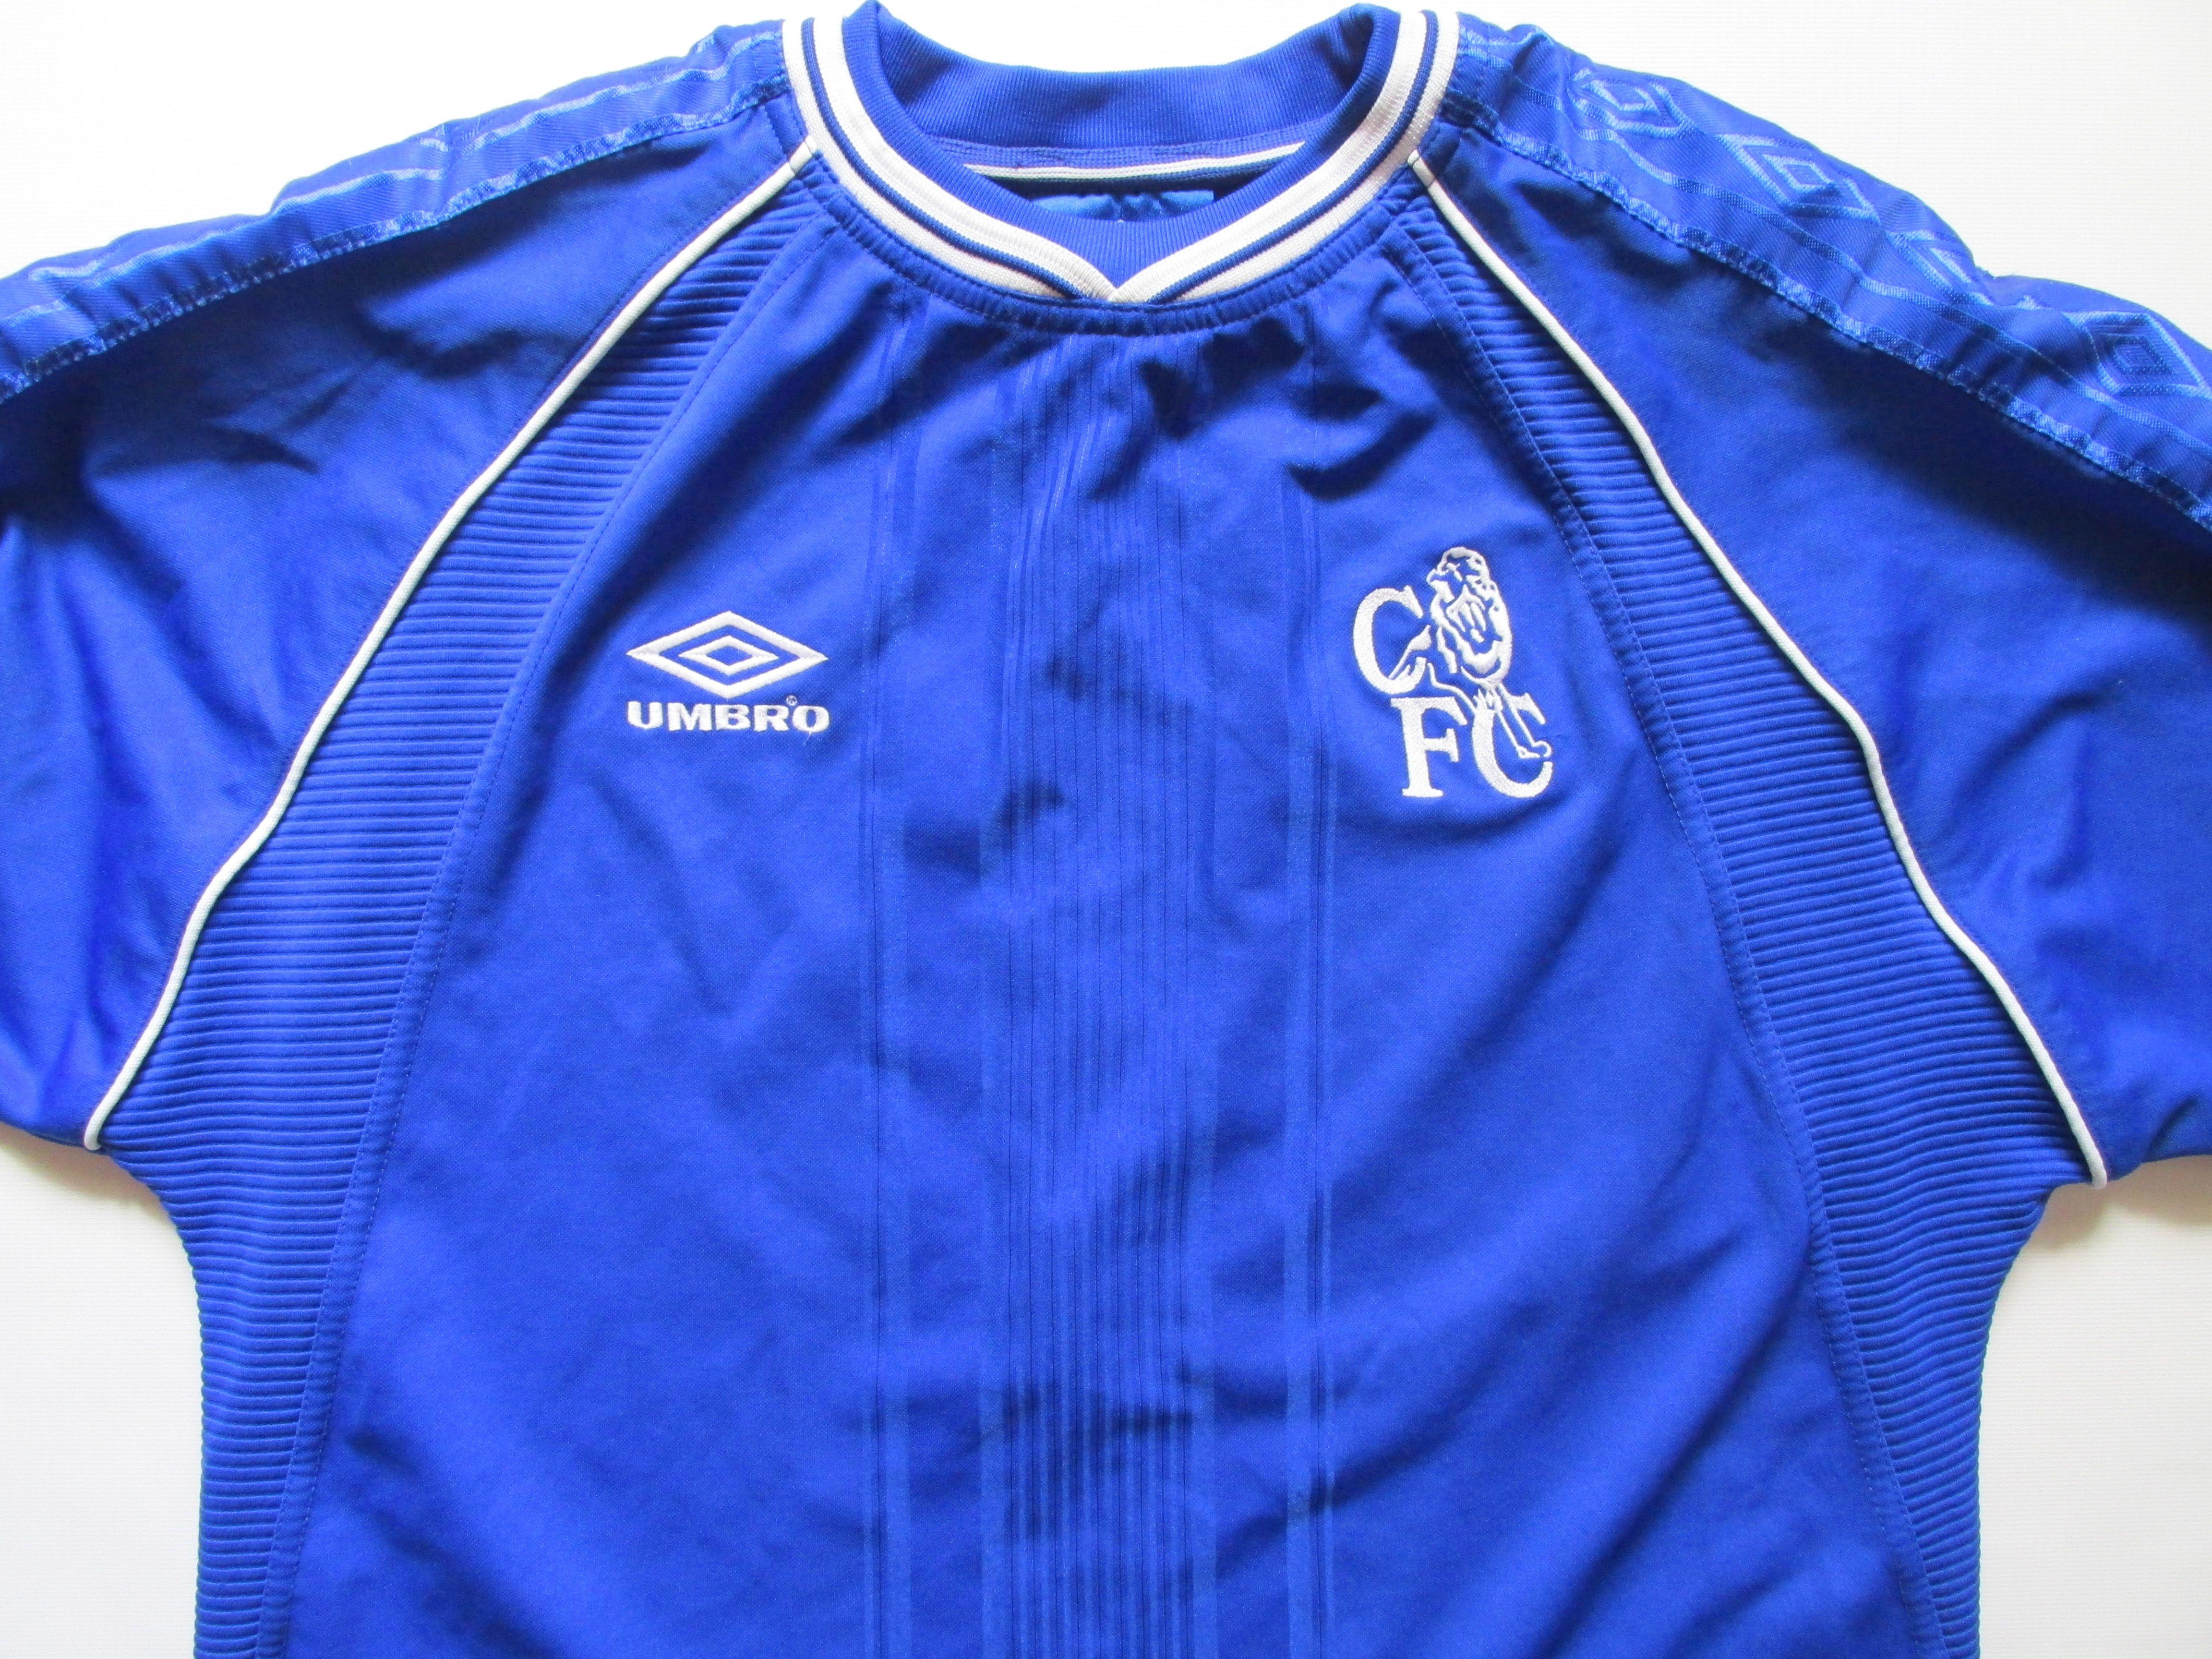 4f9b0e035cb Cheslea 1999/2000/2001 home football shirt by Umbro LongSleeves  PremierLeague vintage 90s CFC soccer jersey #Chelsea #ChelseaFC #CFC #Umbro  #vintage #90s ...